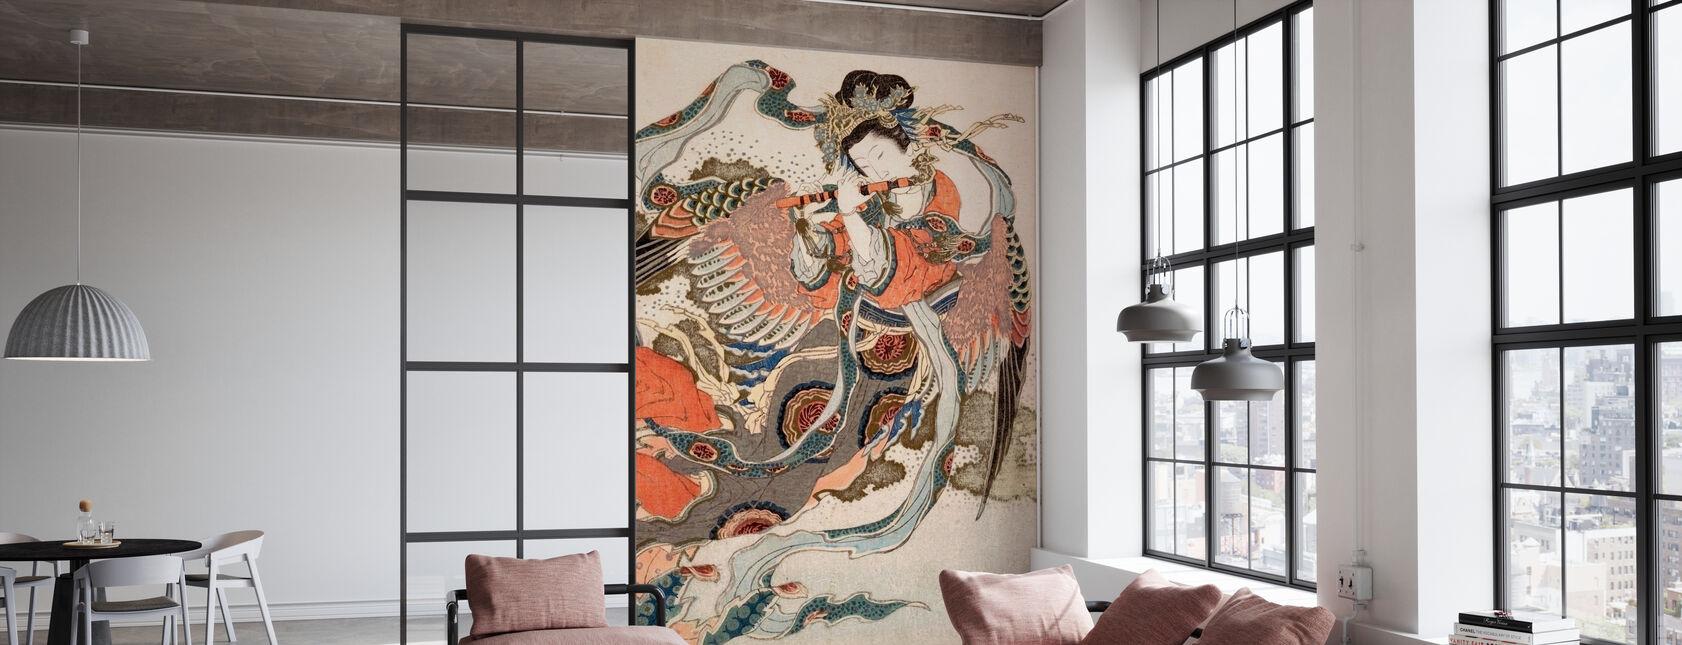 Asian Angel - Wallpaper - Office